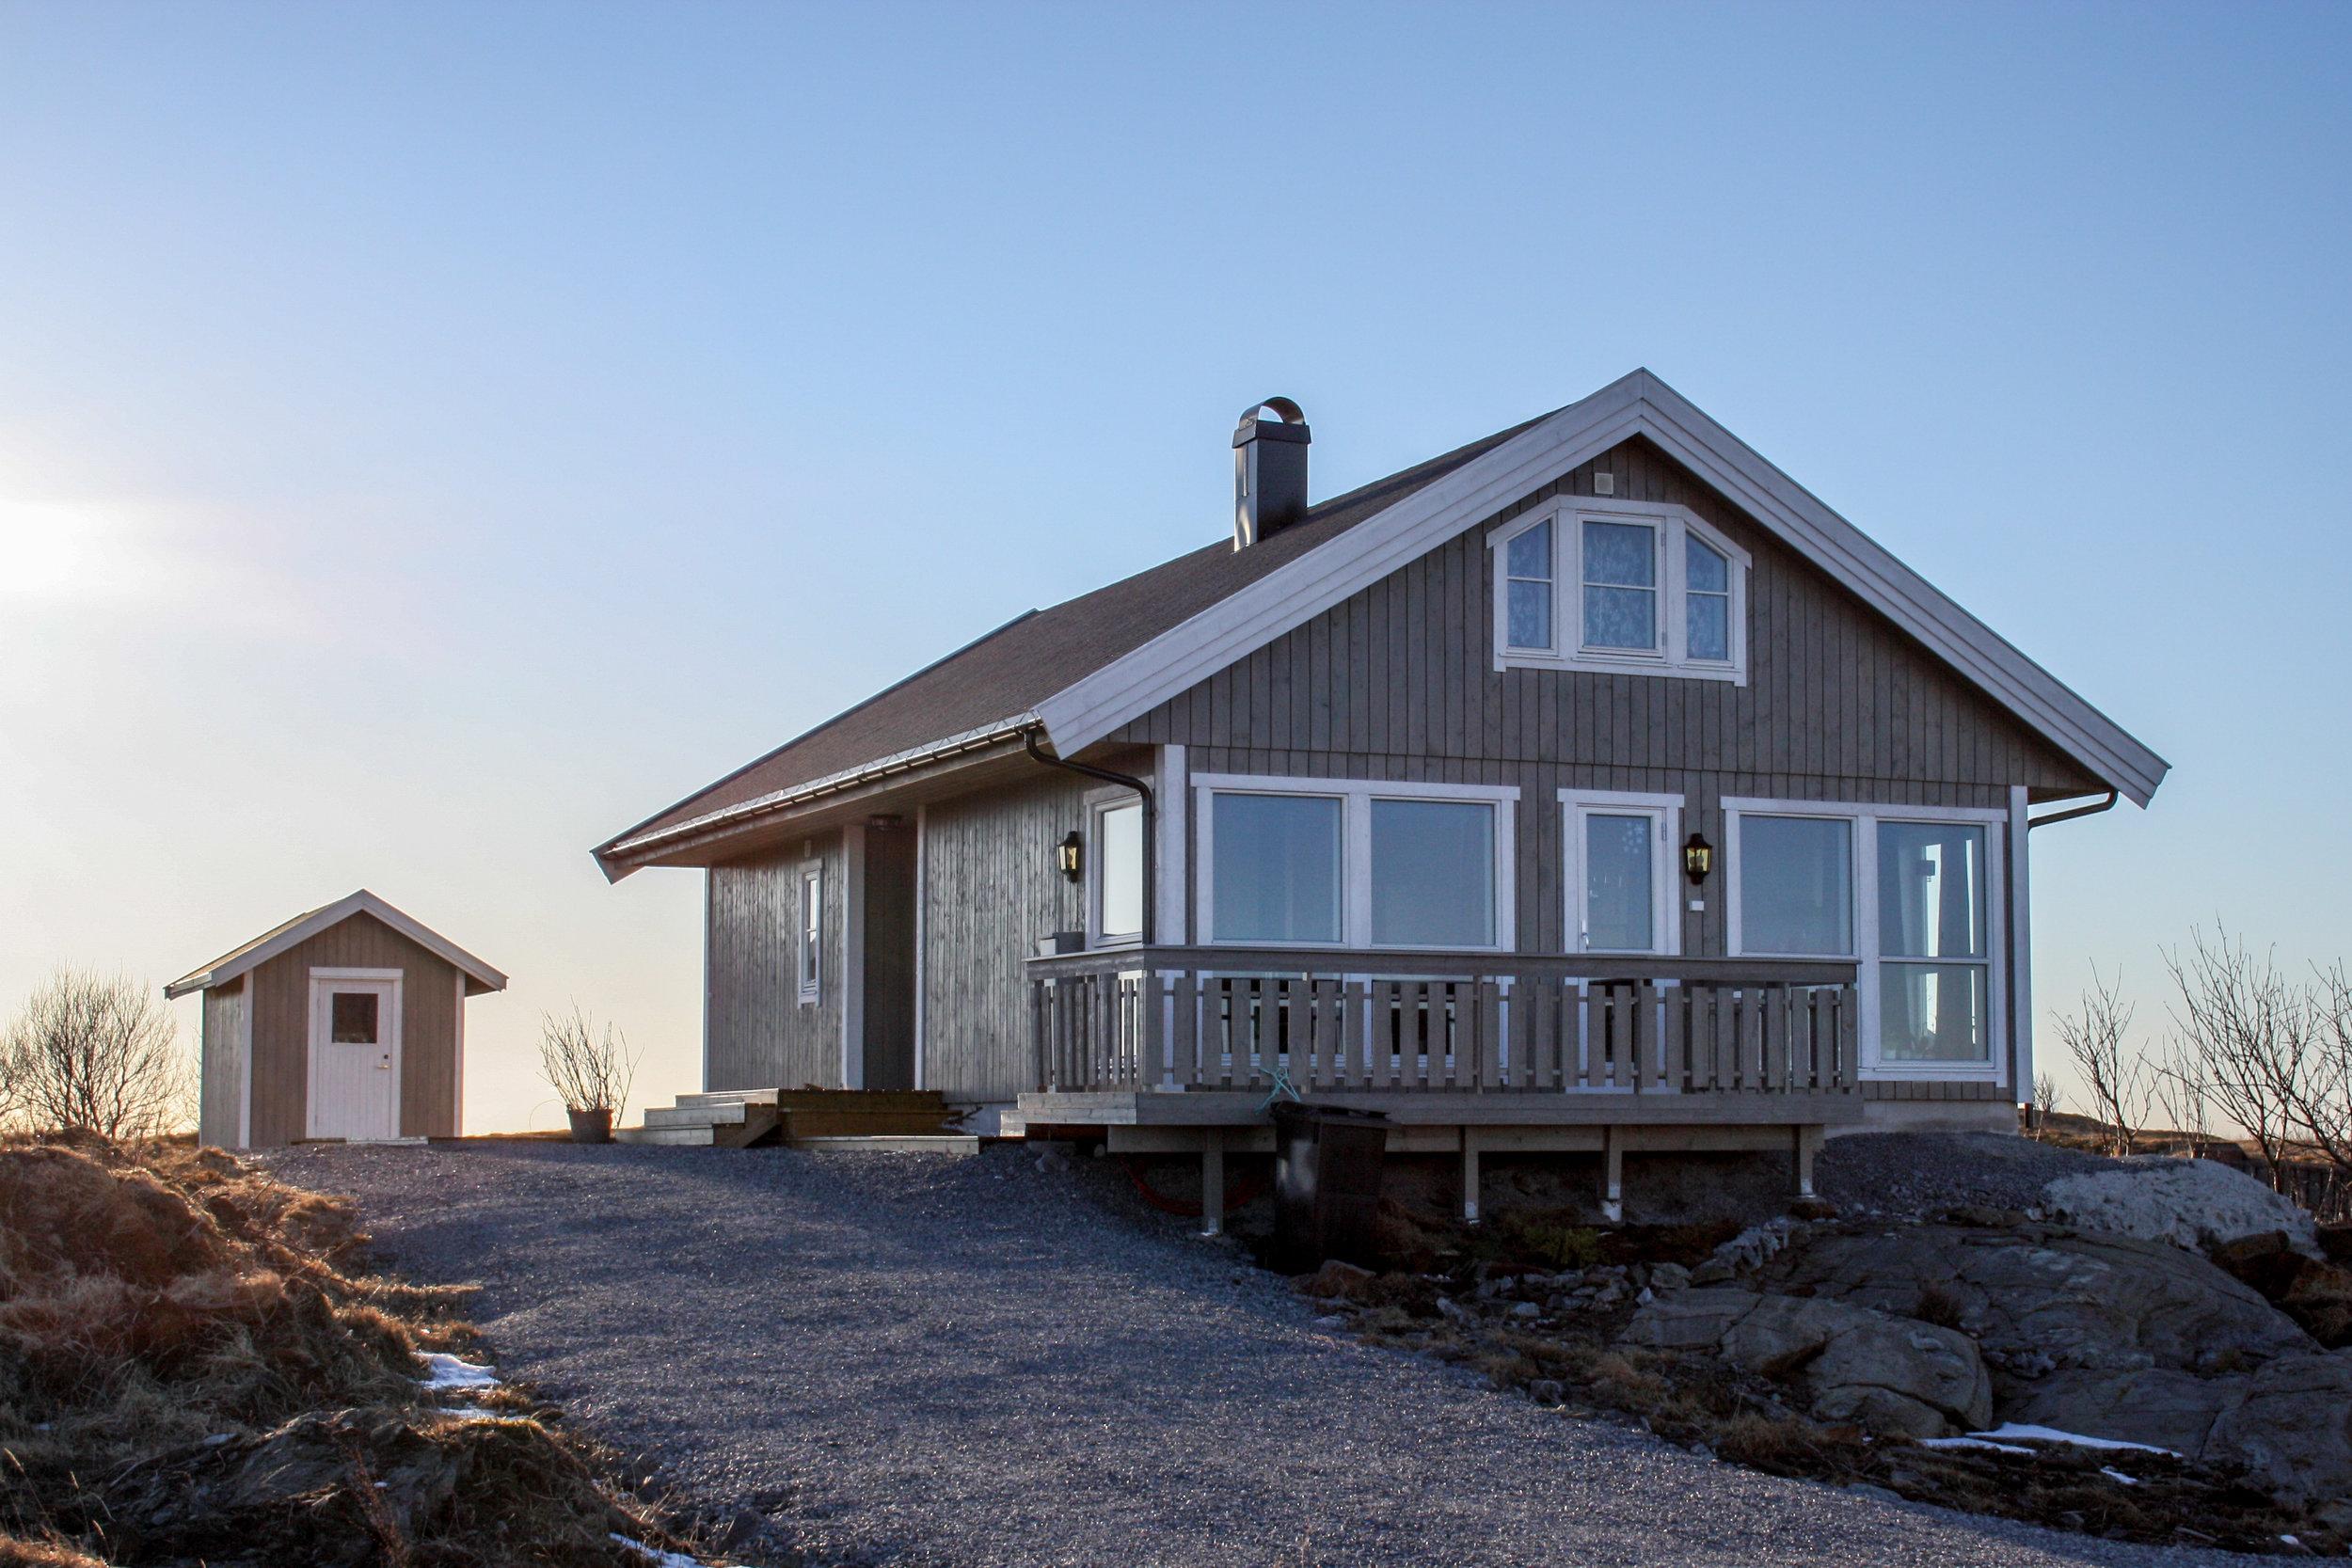 VesterØYen - Gardsøy